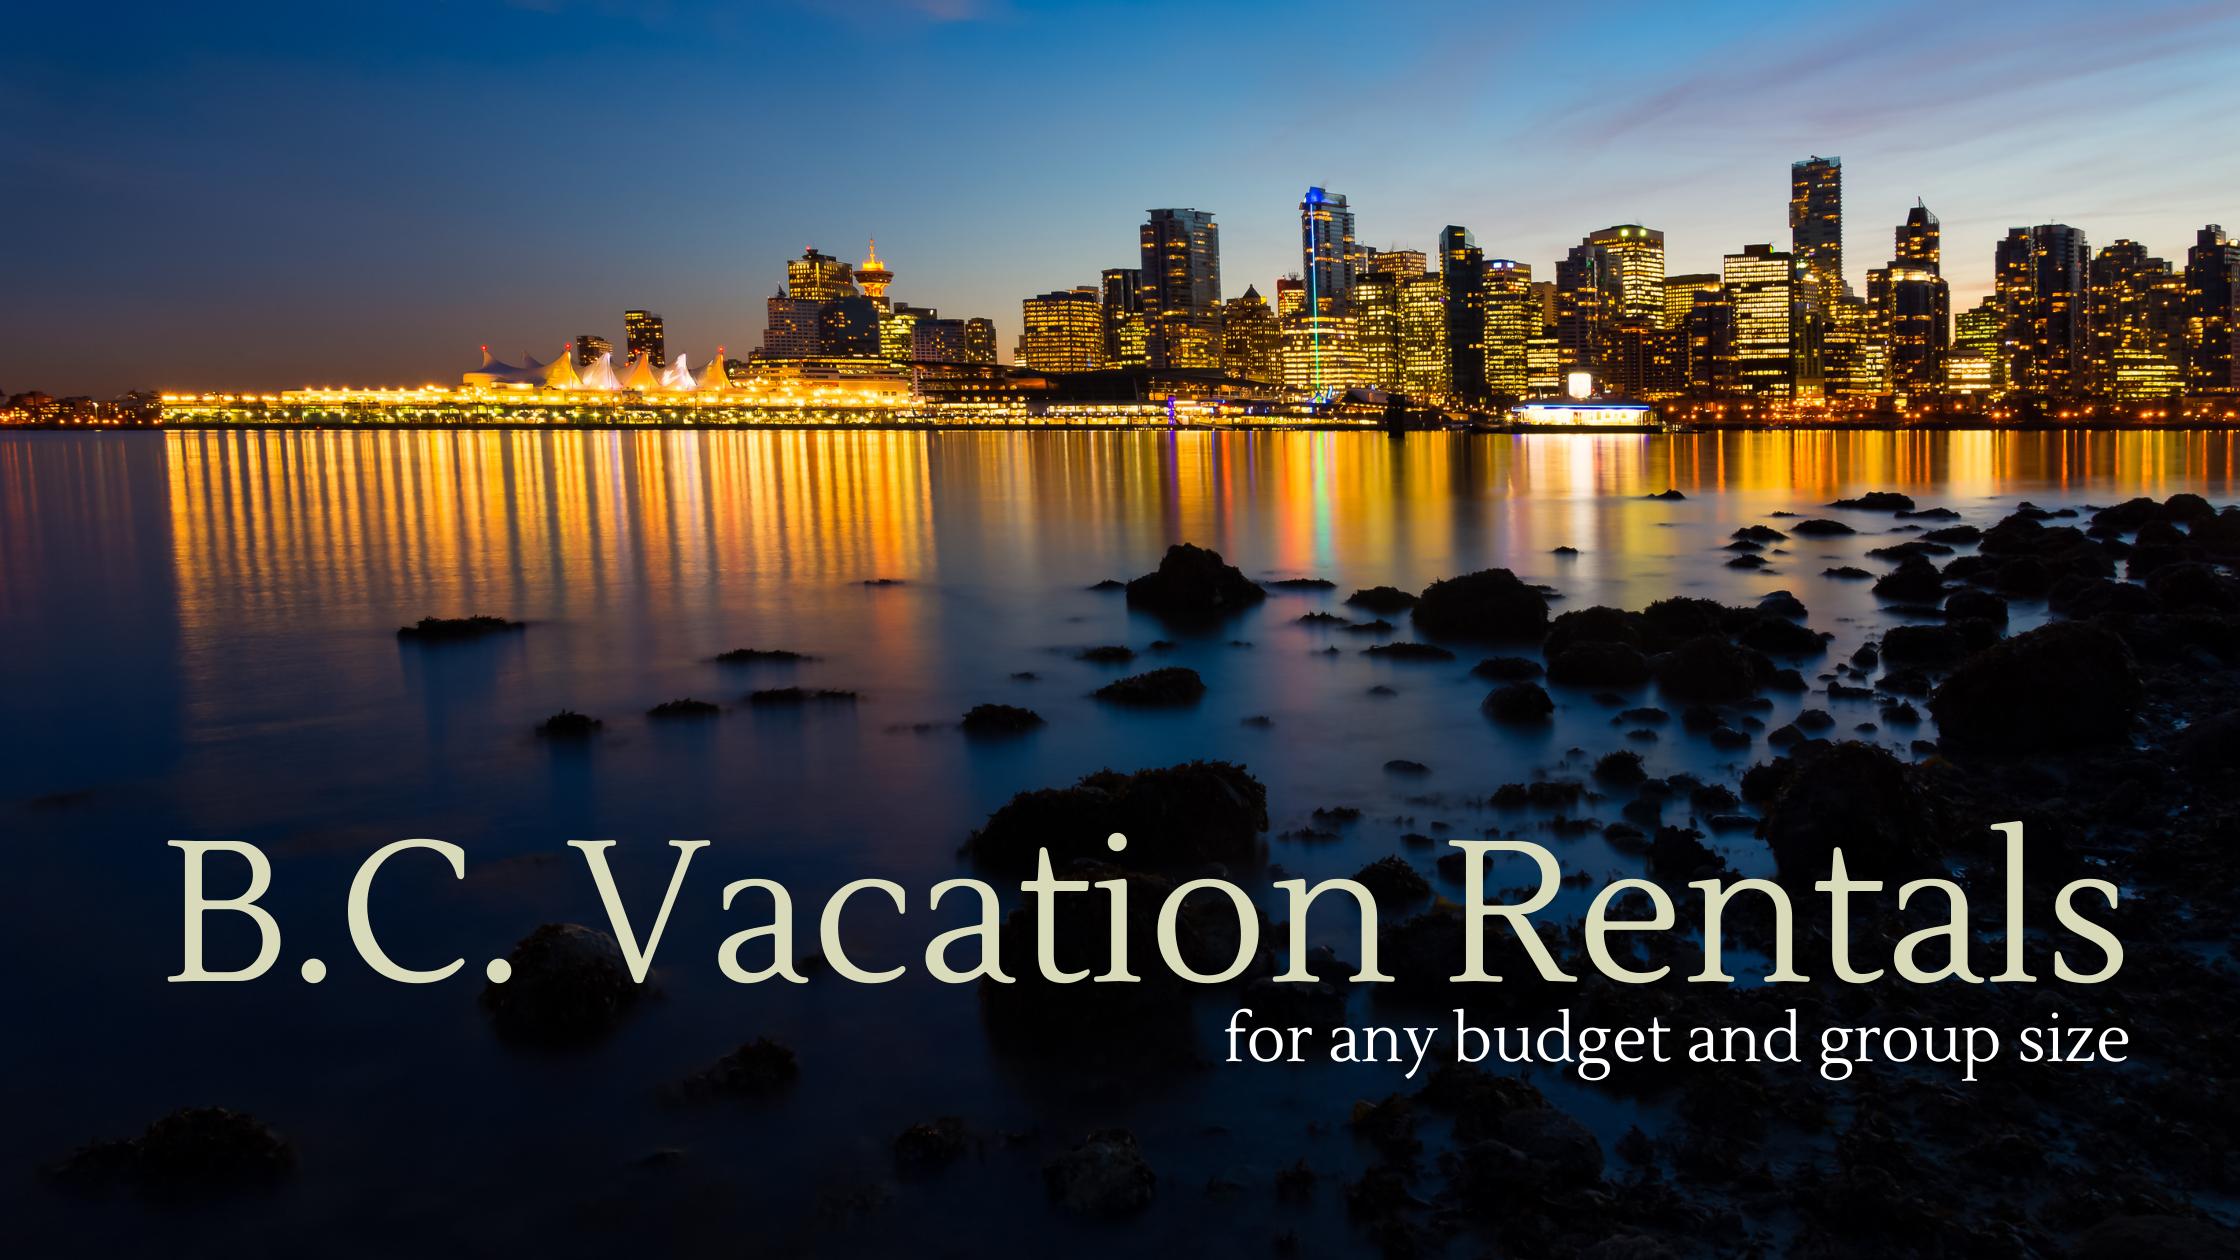 B.C. Vacation Rentals